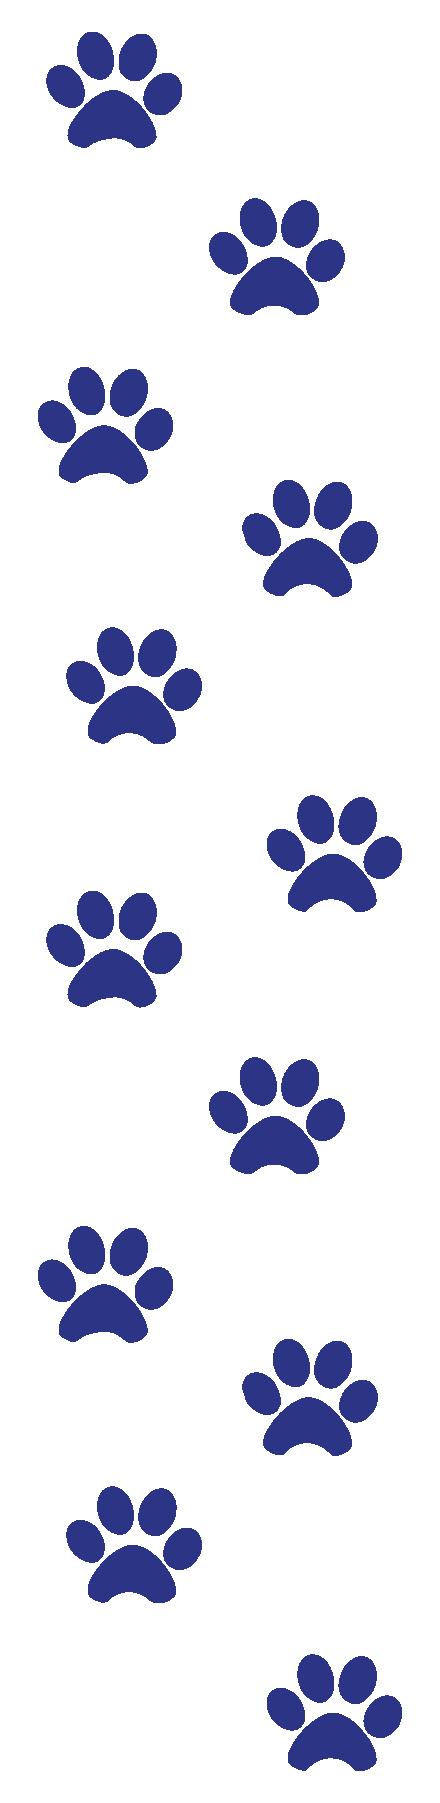 12 blue pawprints